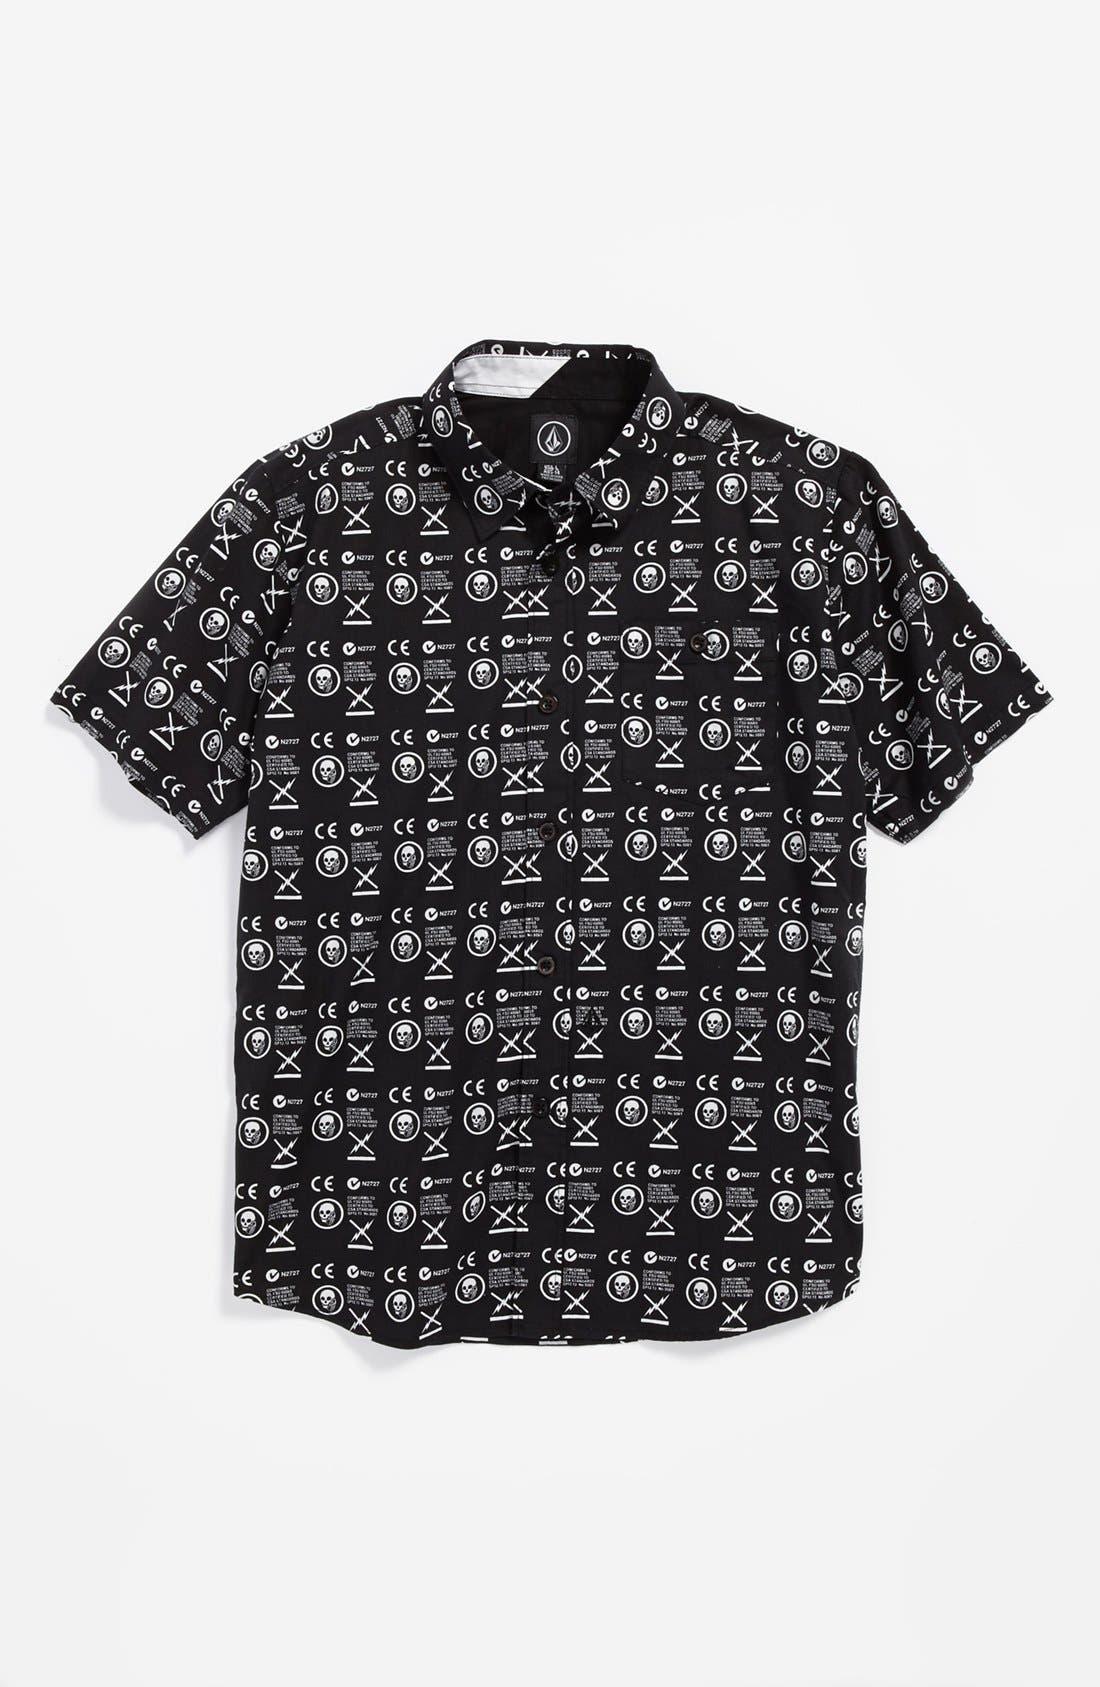 Alternate Image 1 Selected - Volcom 'Skull Phone' Short Sleeve Sport Shirt (Big Boys)